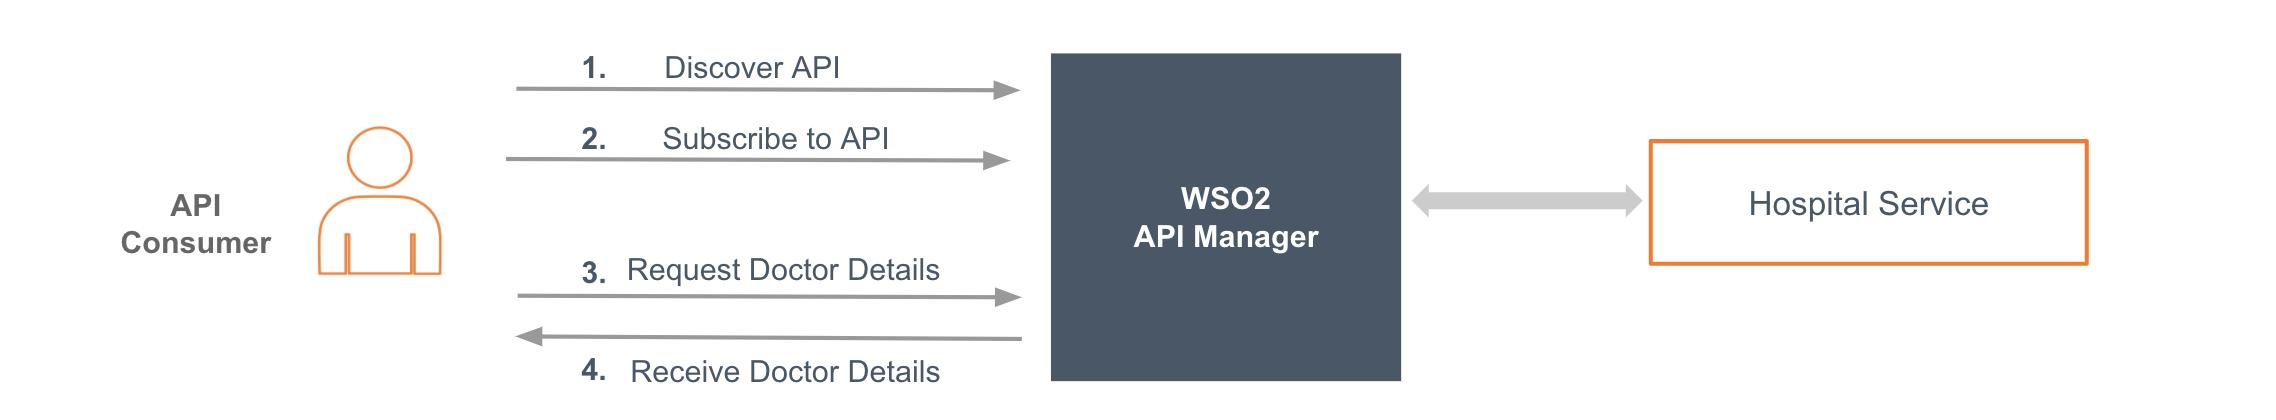 exposing integration service as a managed api